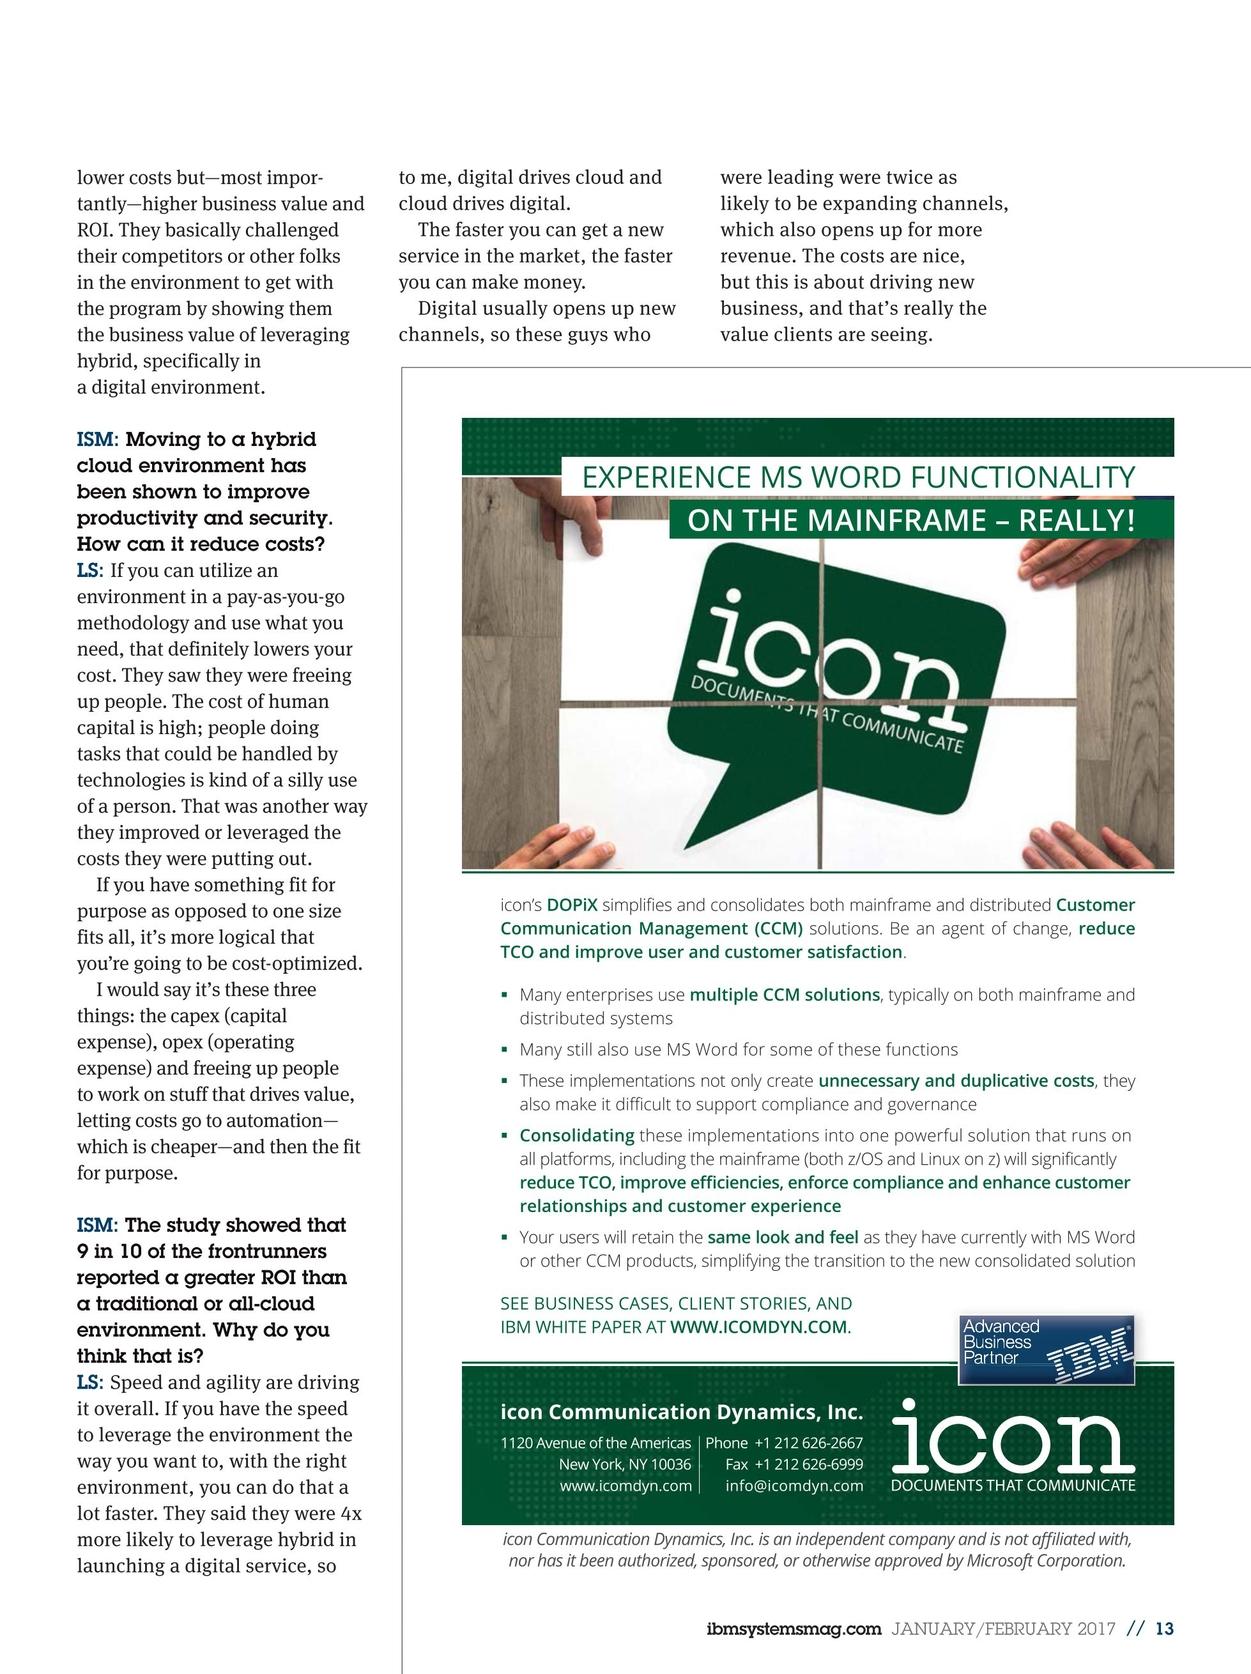 IBM Systems Magazine, Mainframe - January/February 2017